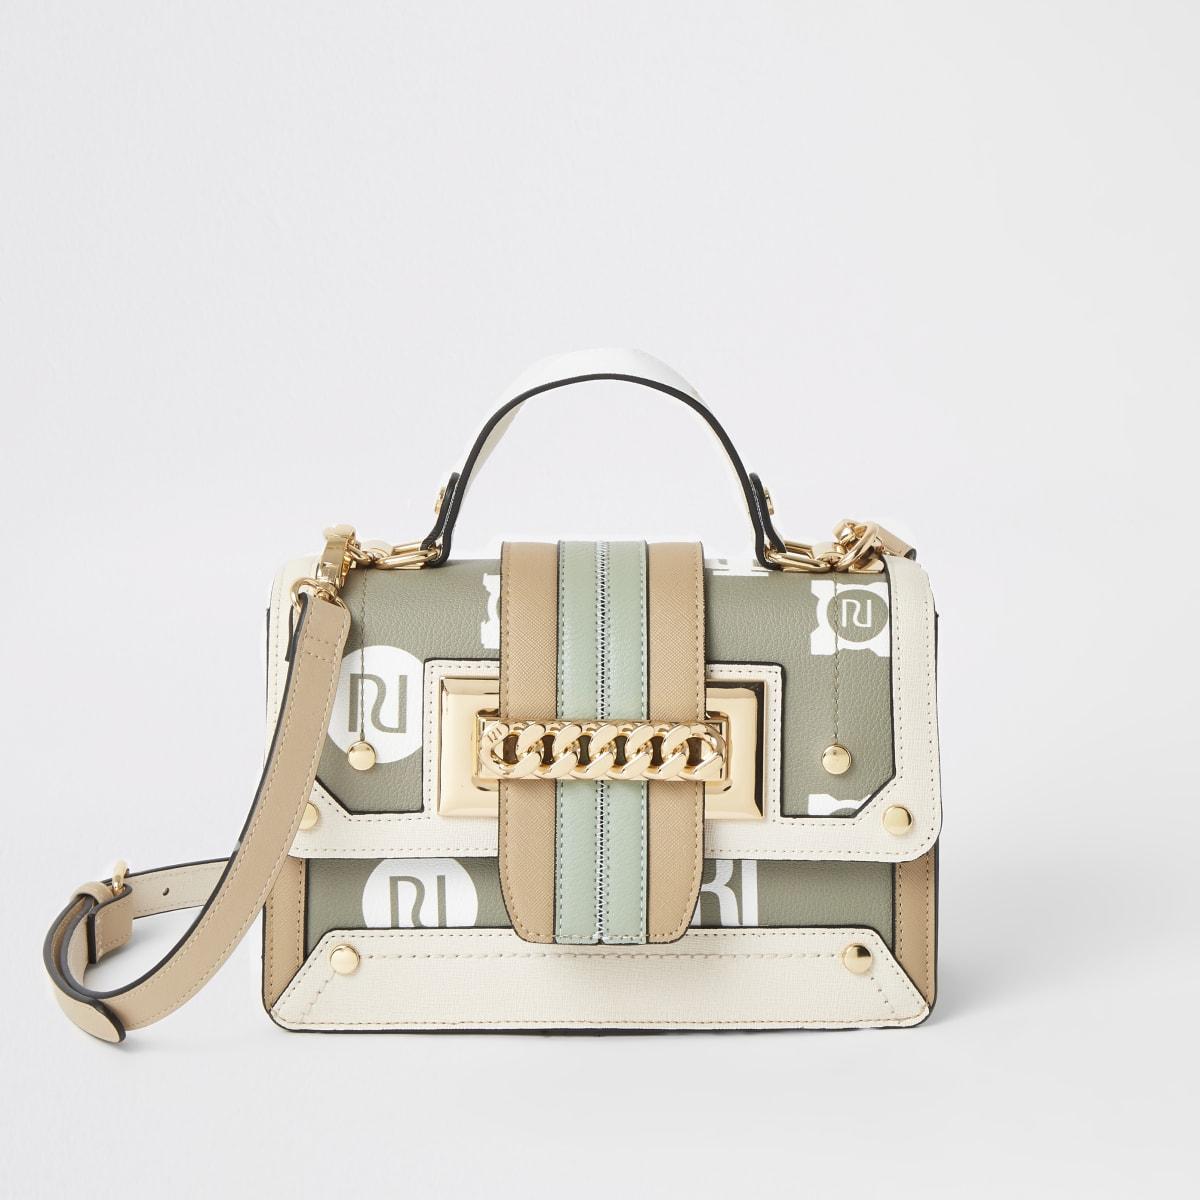 Khaki RI chain front cross body satchel bag